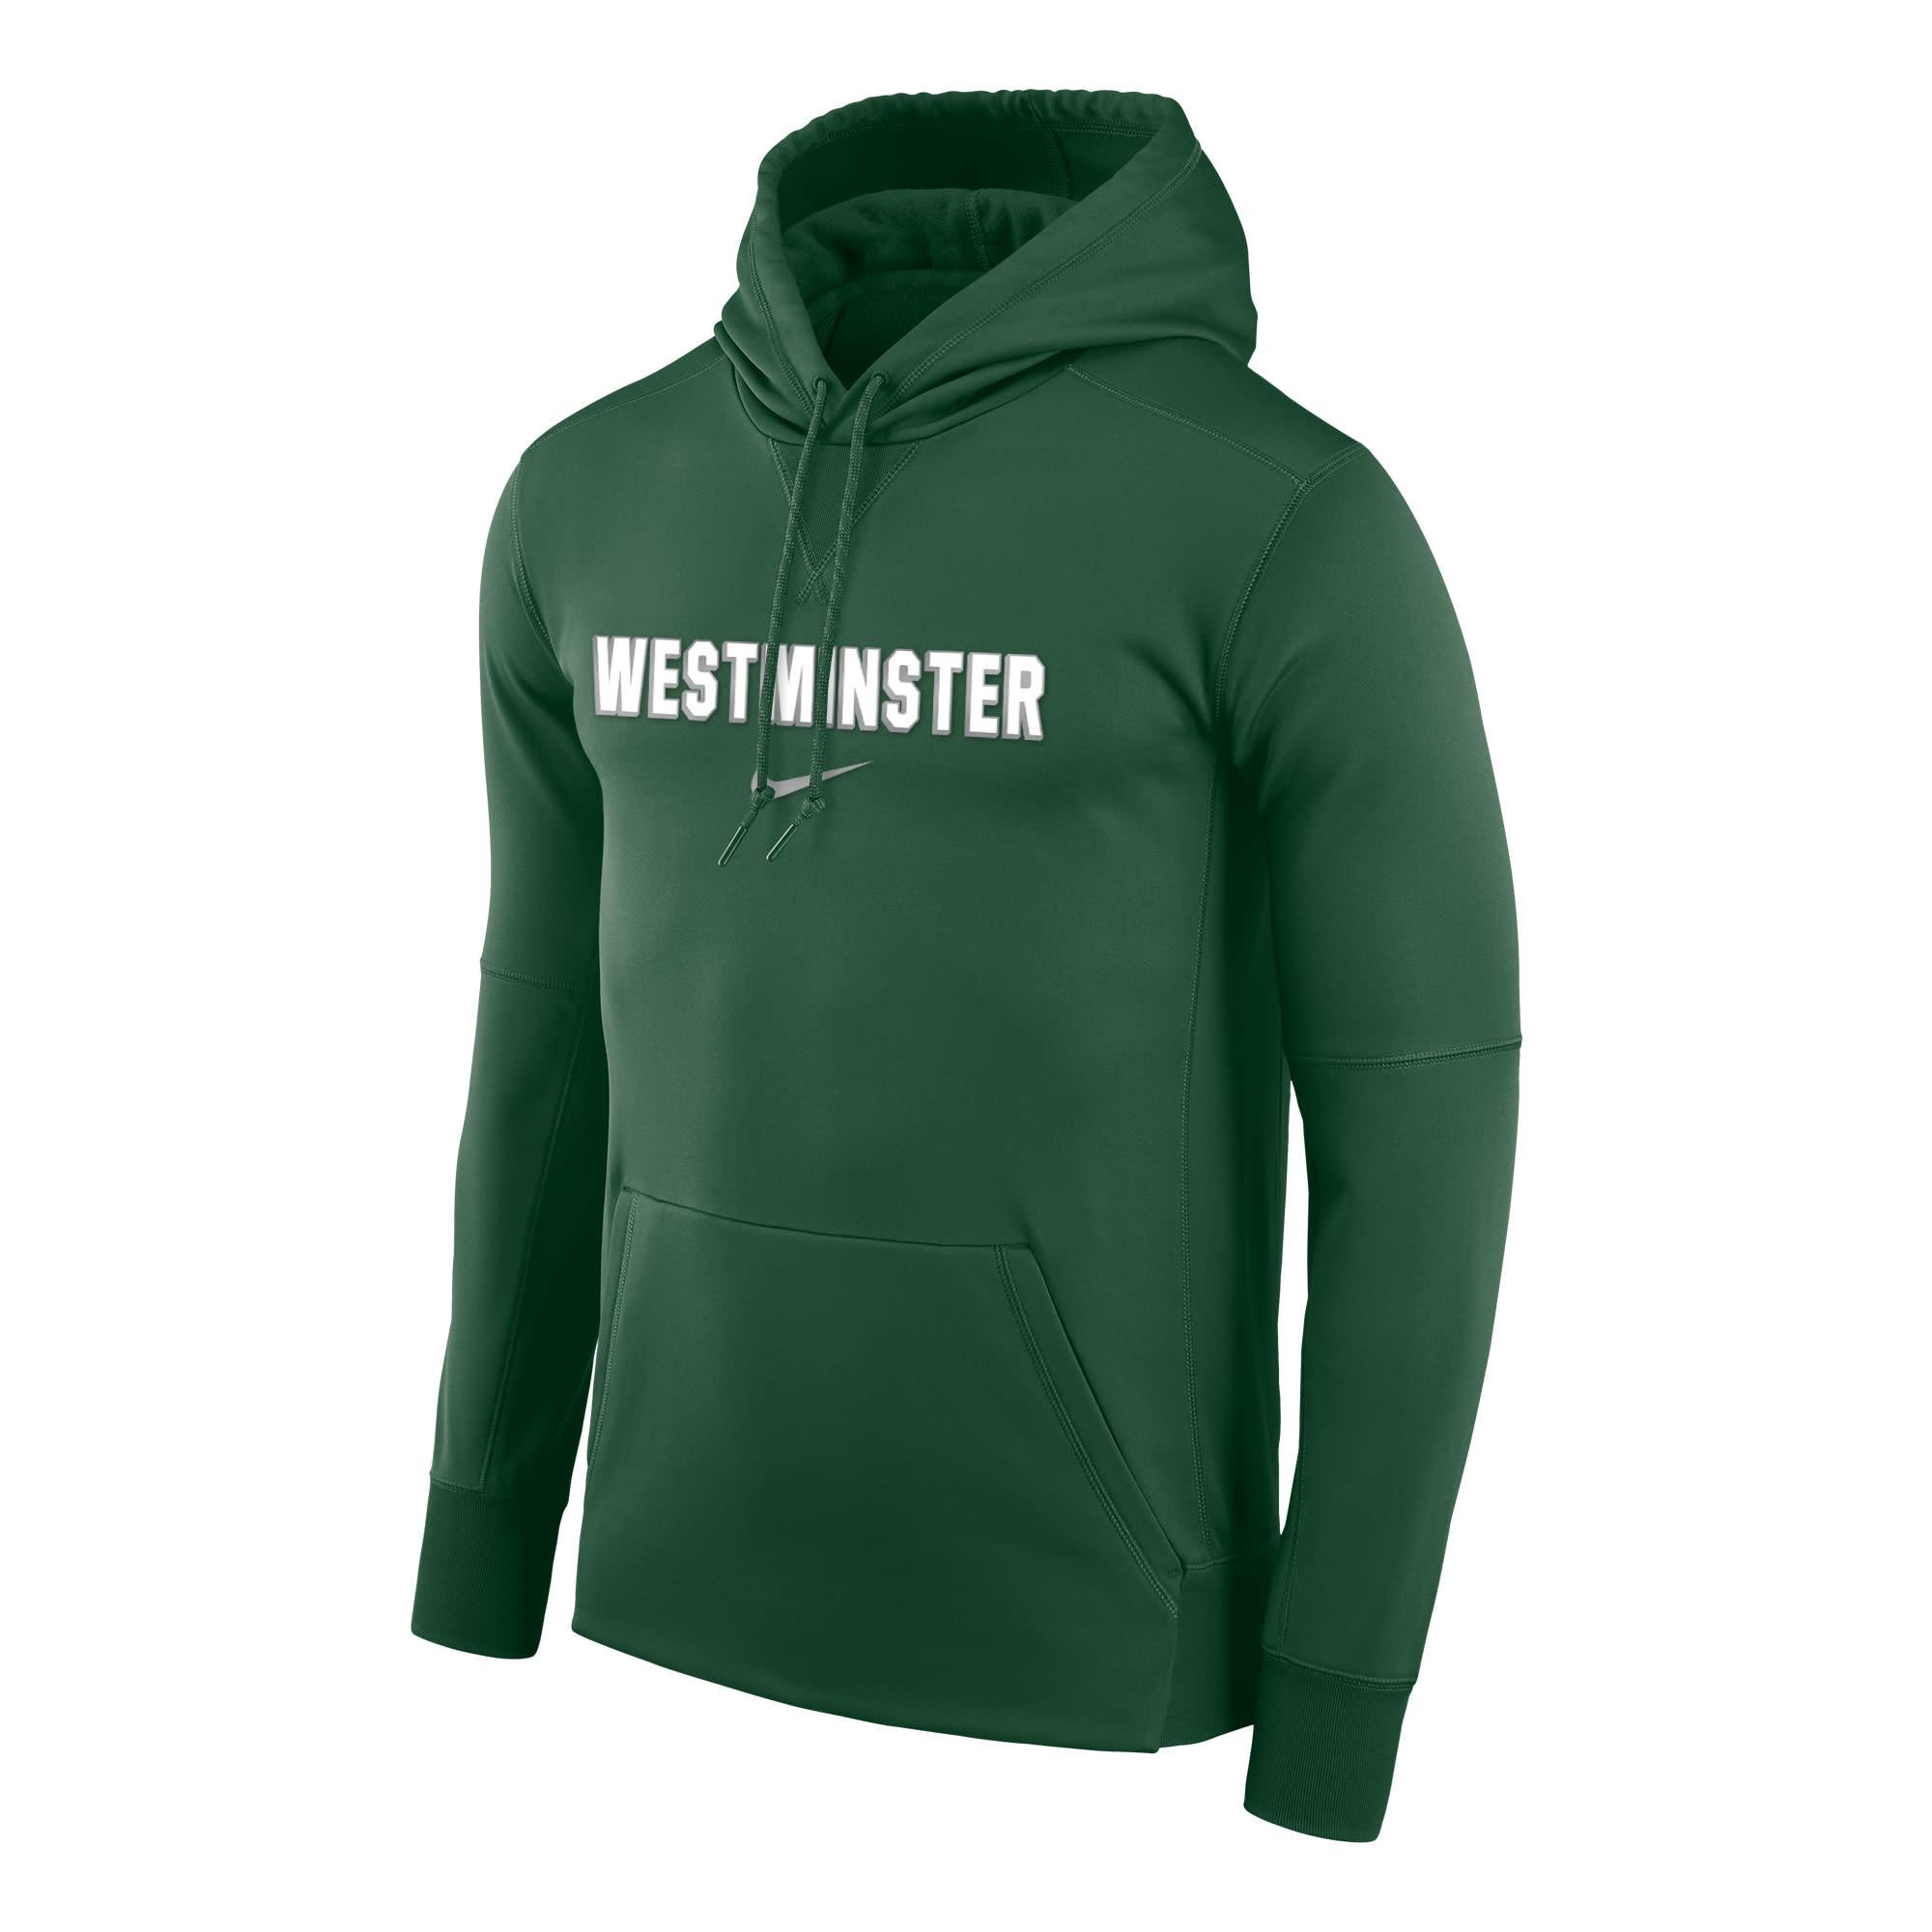 Nike Sweatshirt: Nike Therma PO Hoody - Green w/Westminster